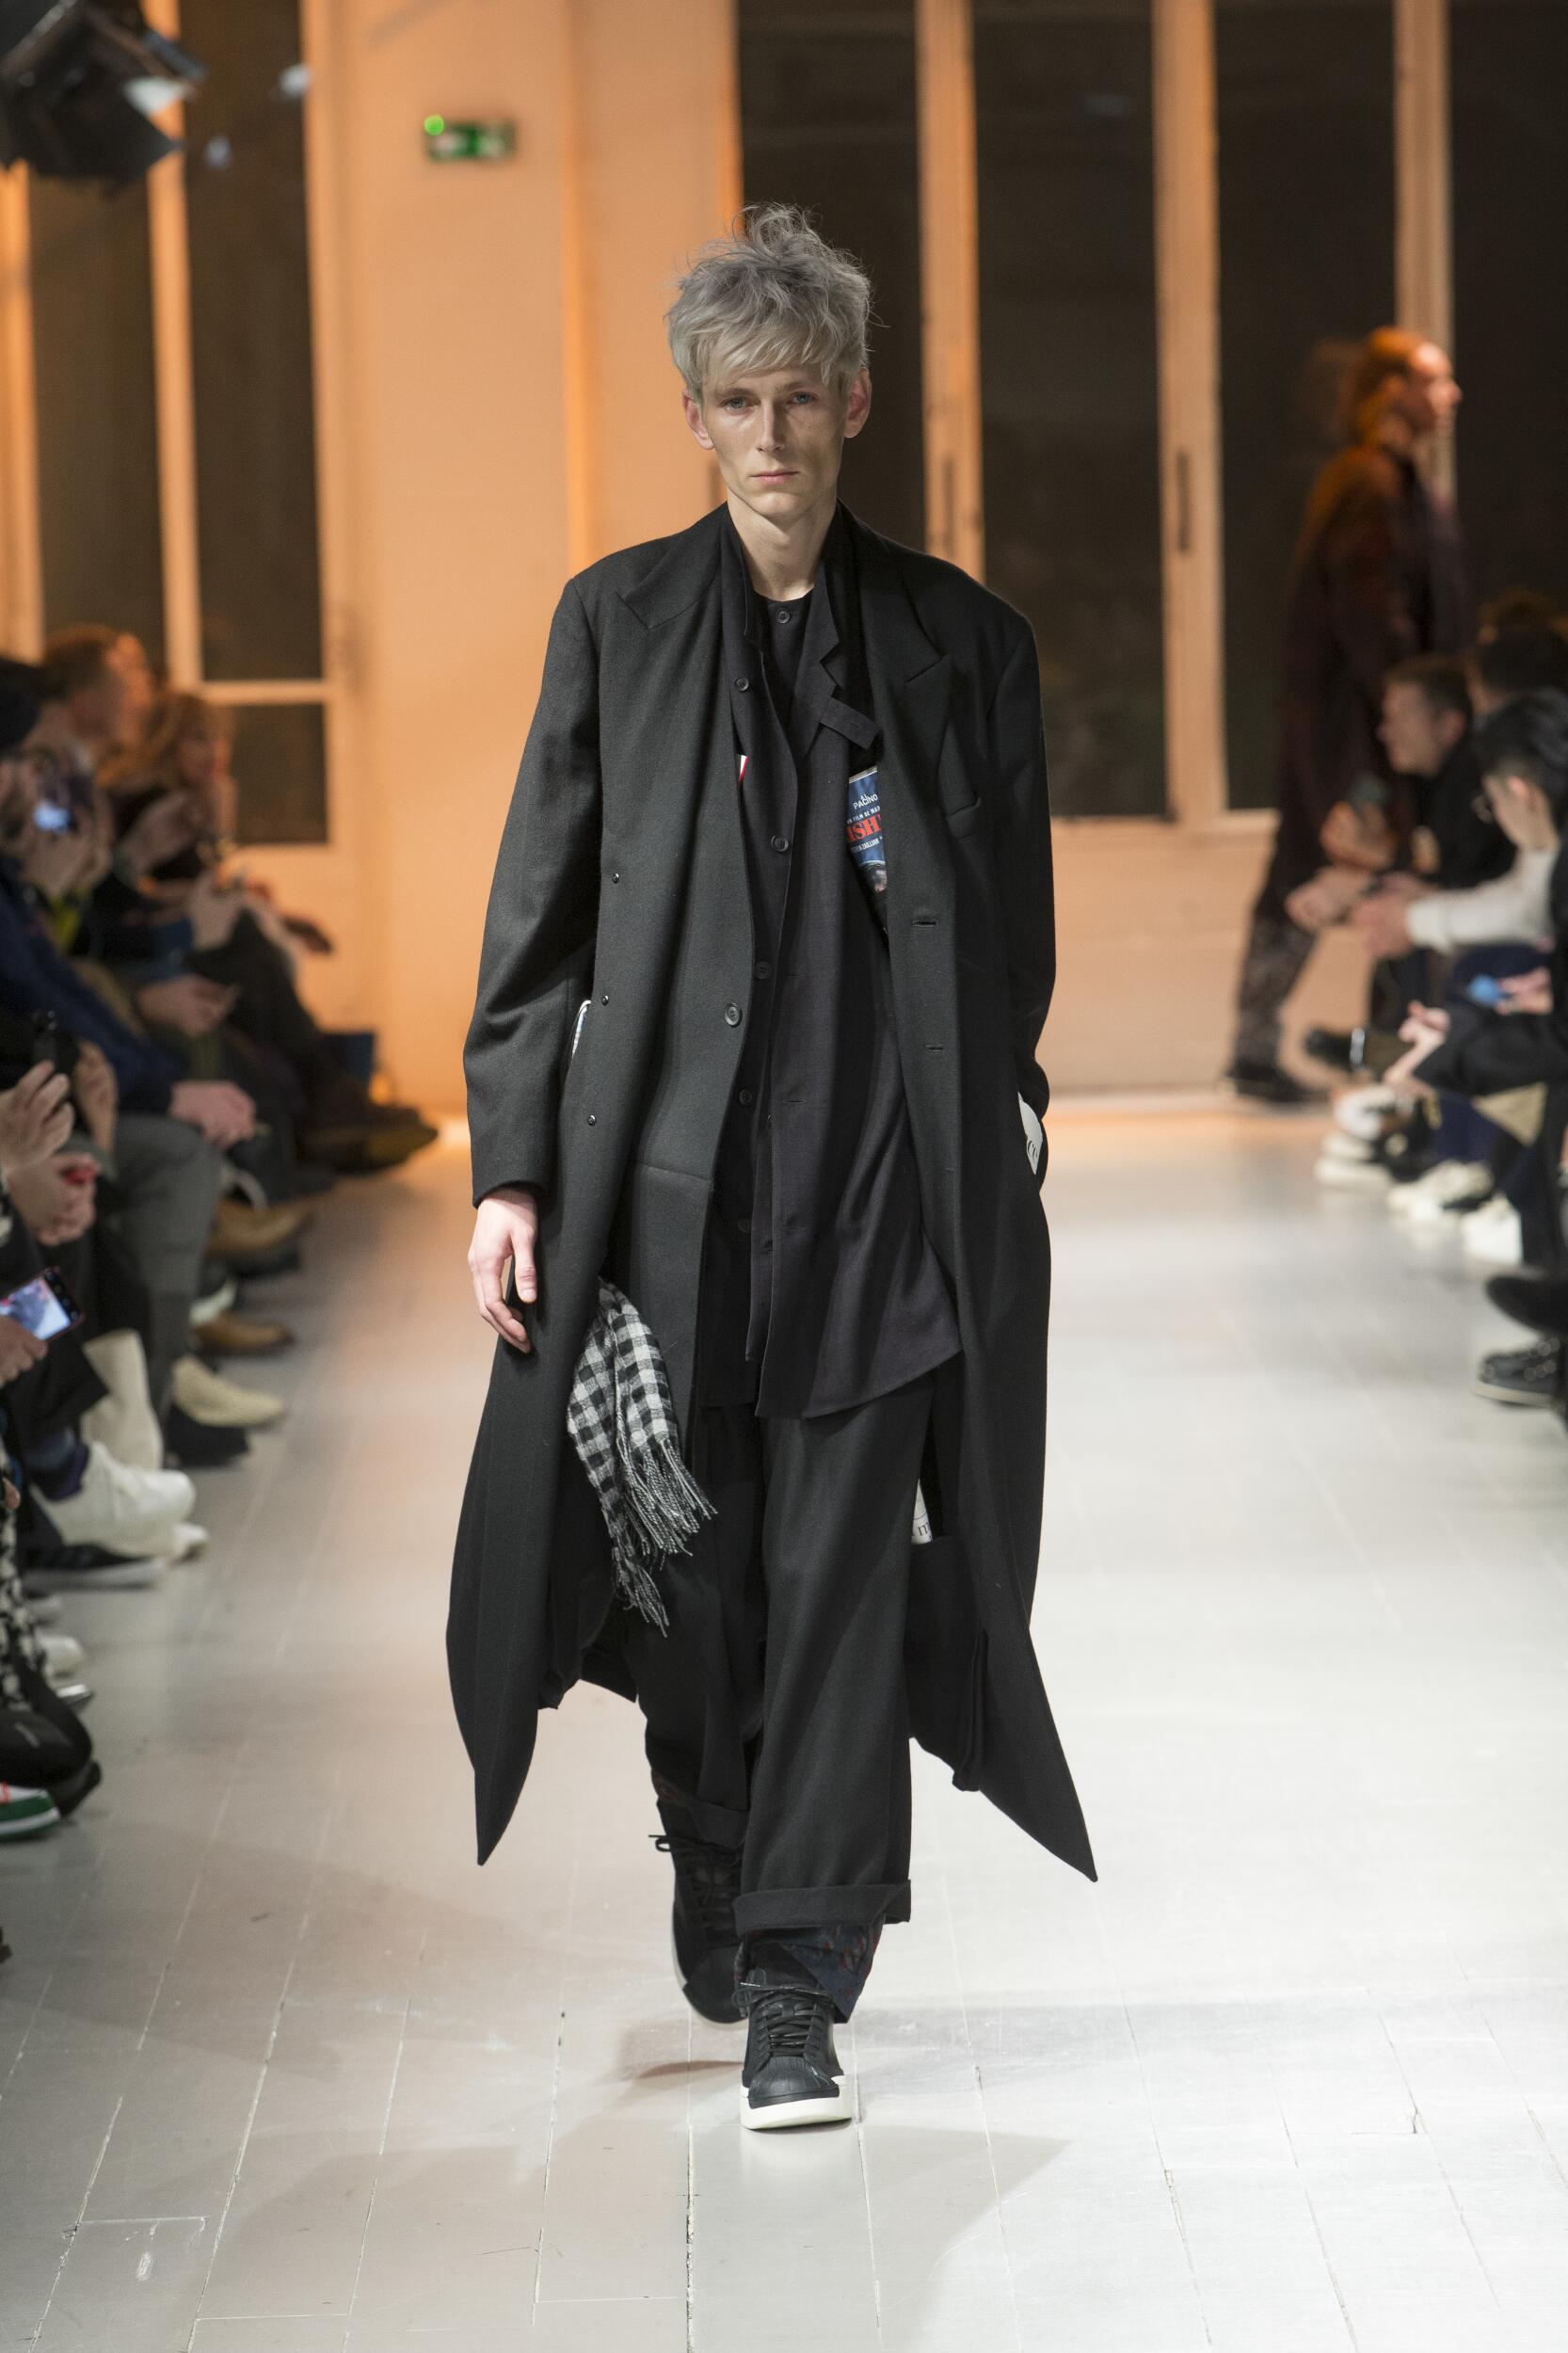 Yohji Yamamoto FW 2020 Menswear